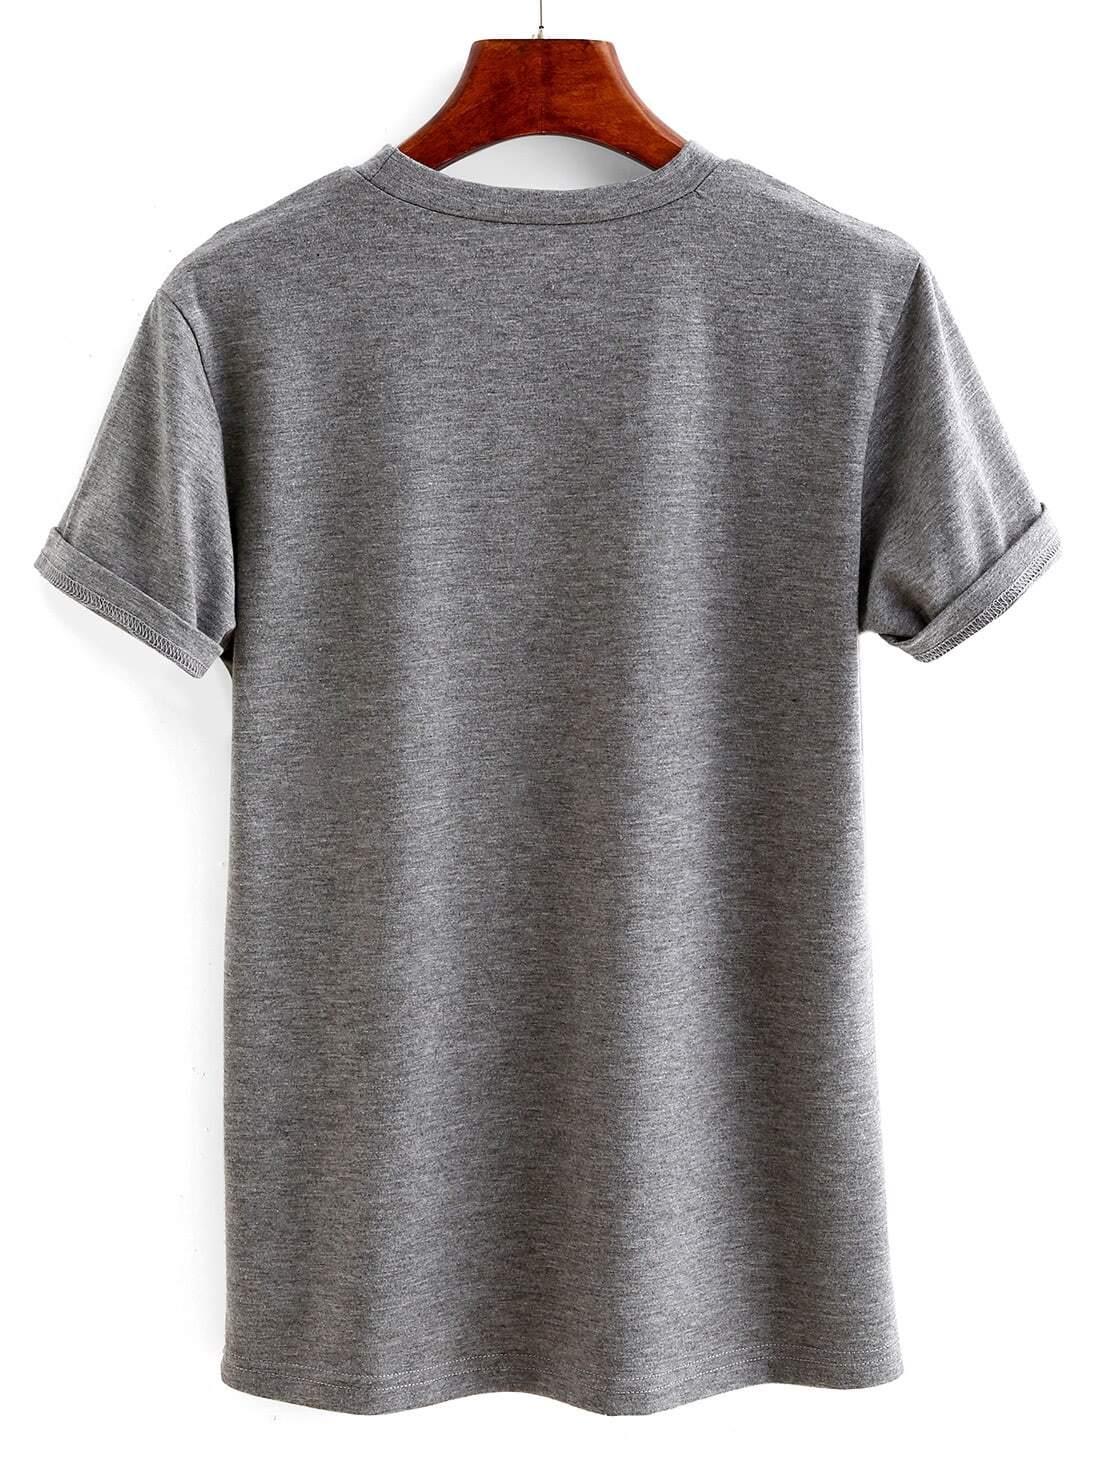 Grey Letter Print Cuffed T-shirt